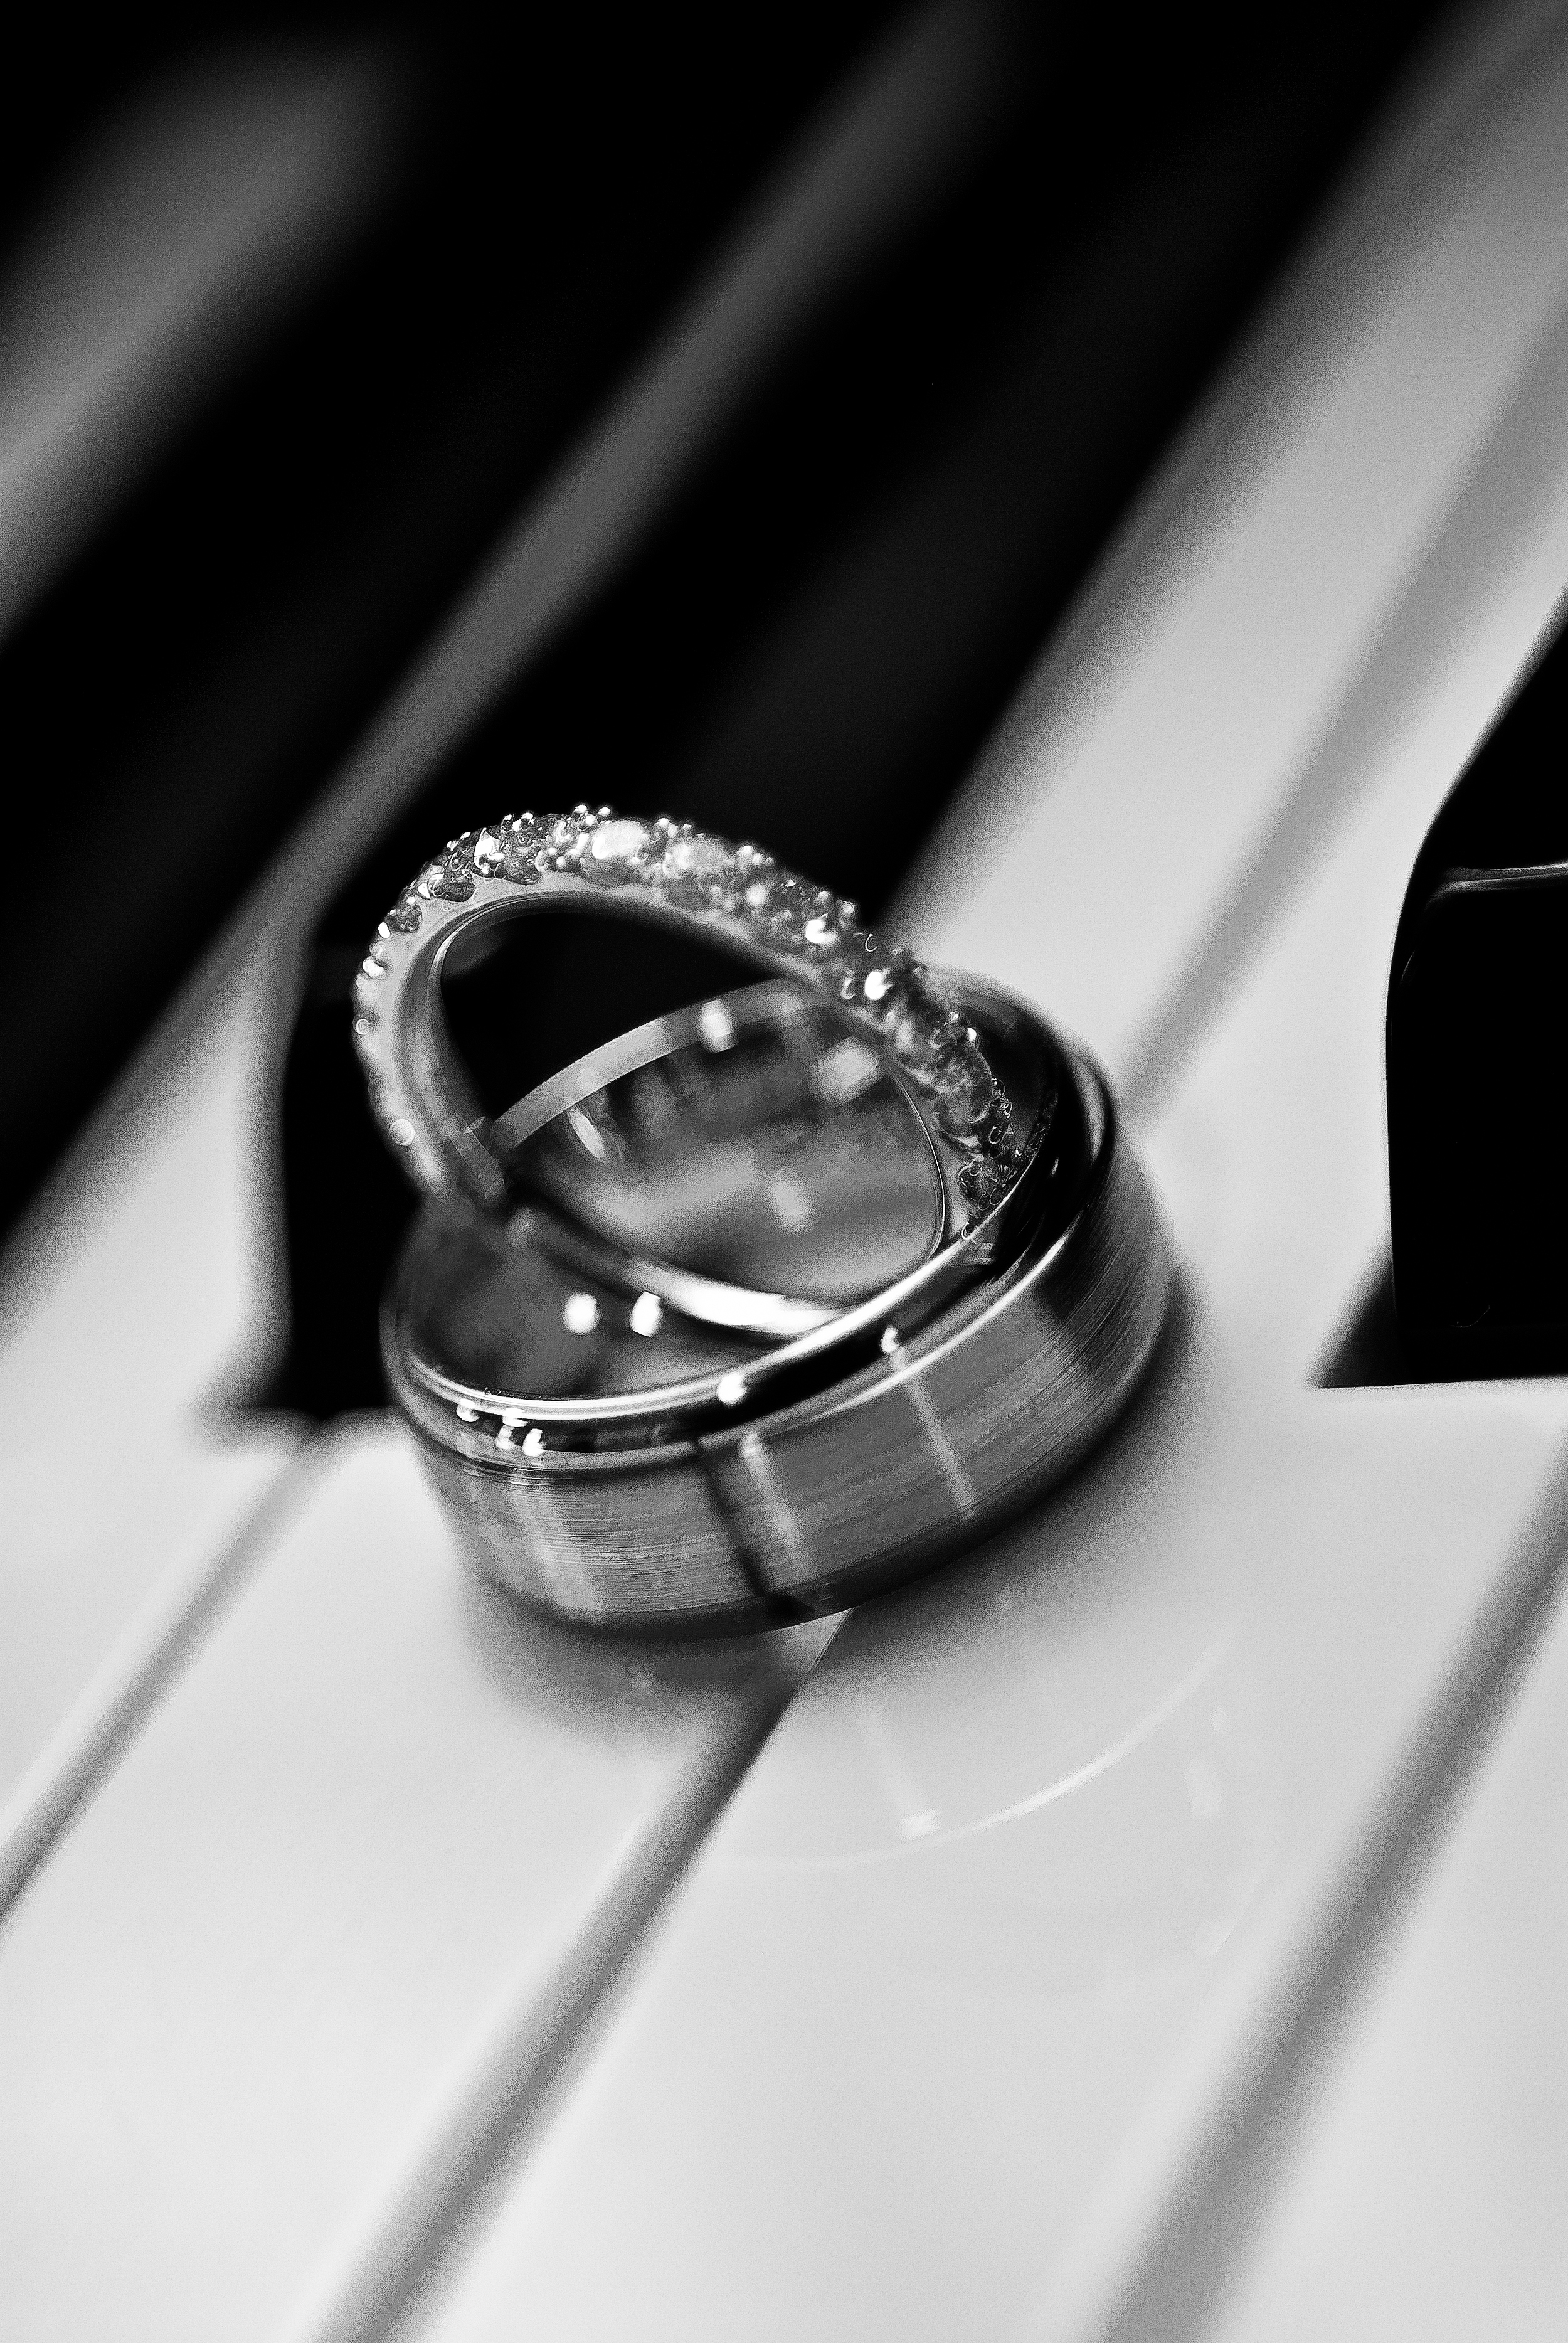 Wedding Rings on Piano at a Wedding